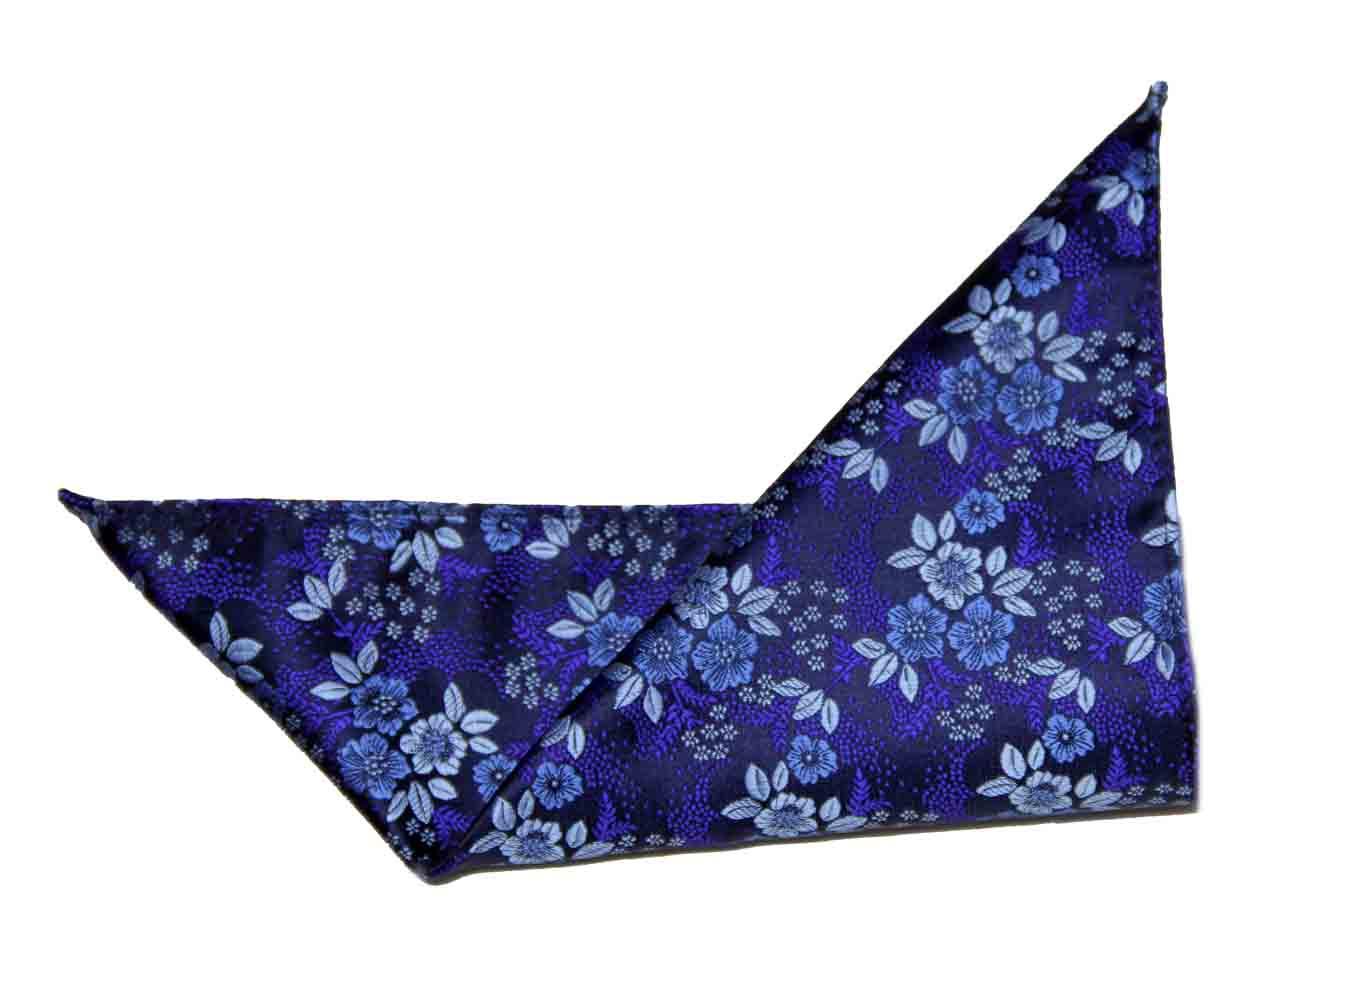 Gascoigne Silk Pocket Square Floral Blue Black Purple Men's